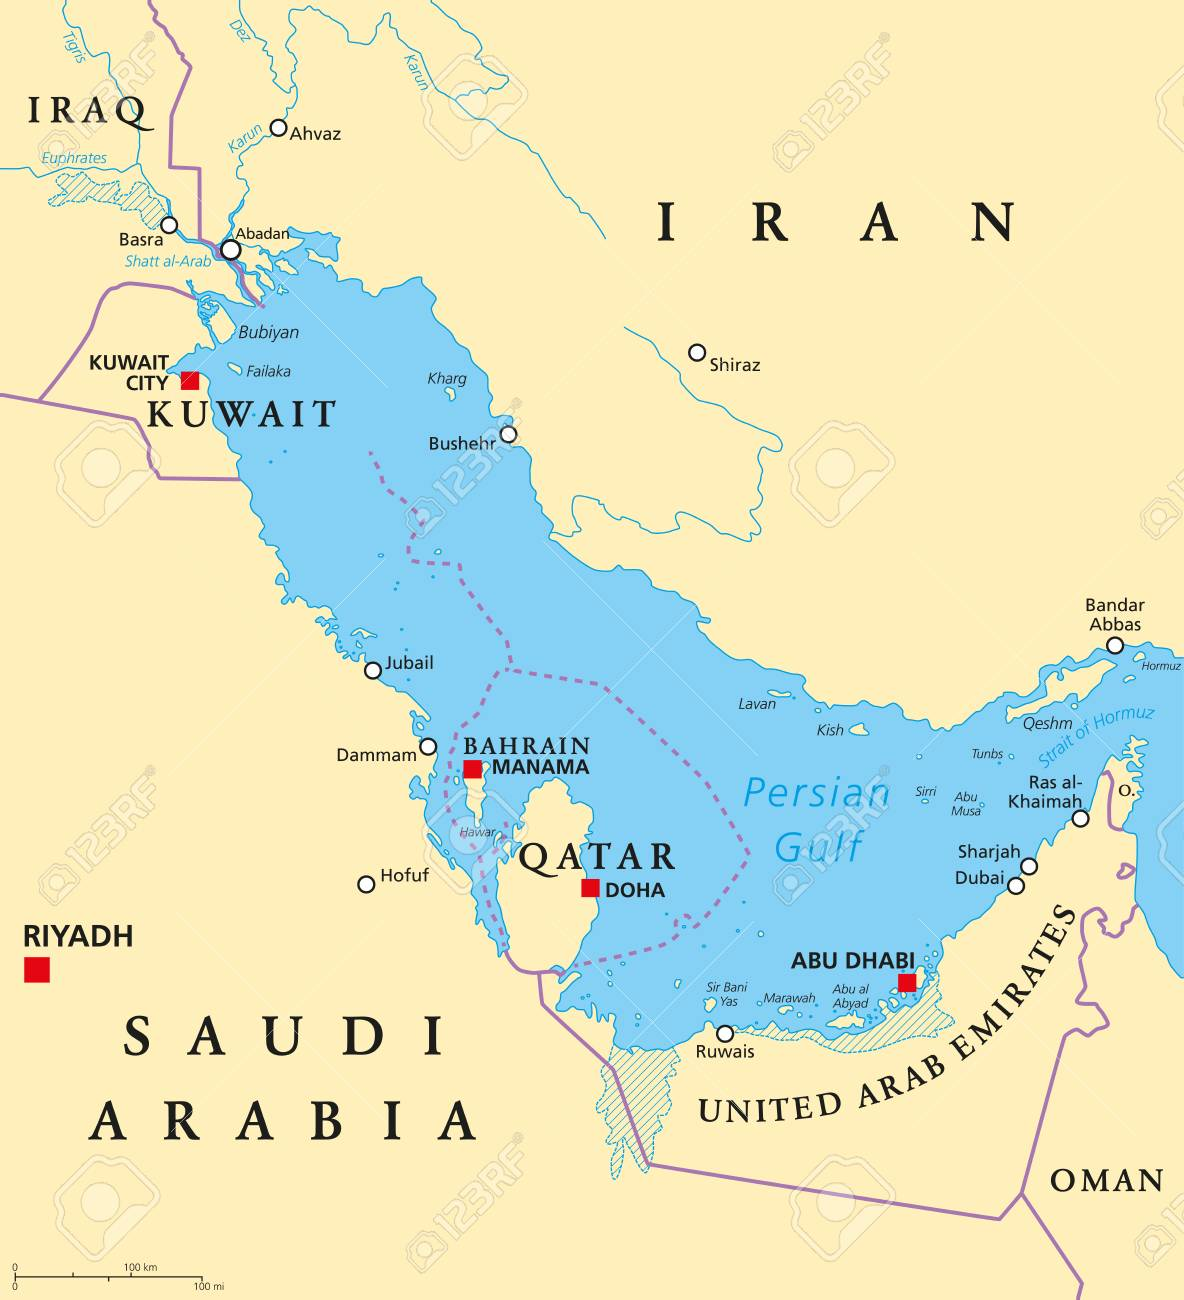 Persische Golf Region Lander Politische Karte Hauptstadte